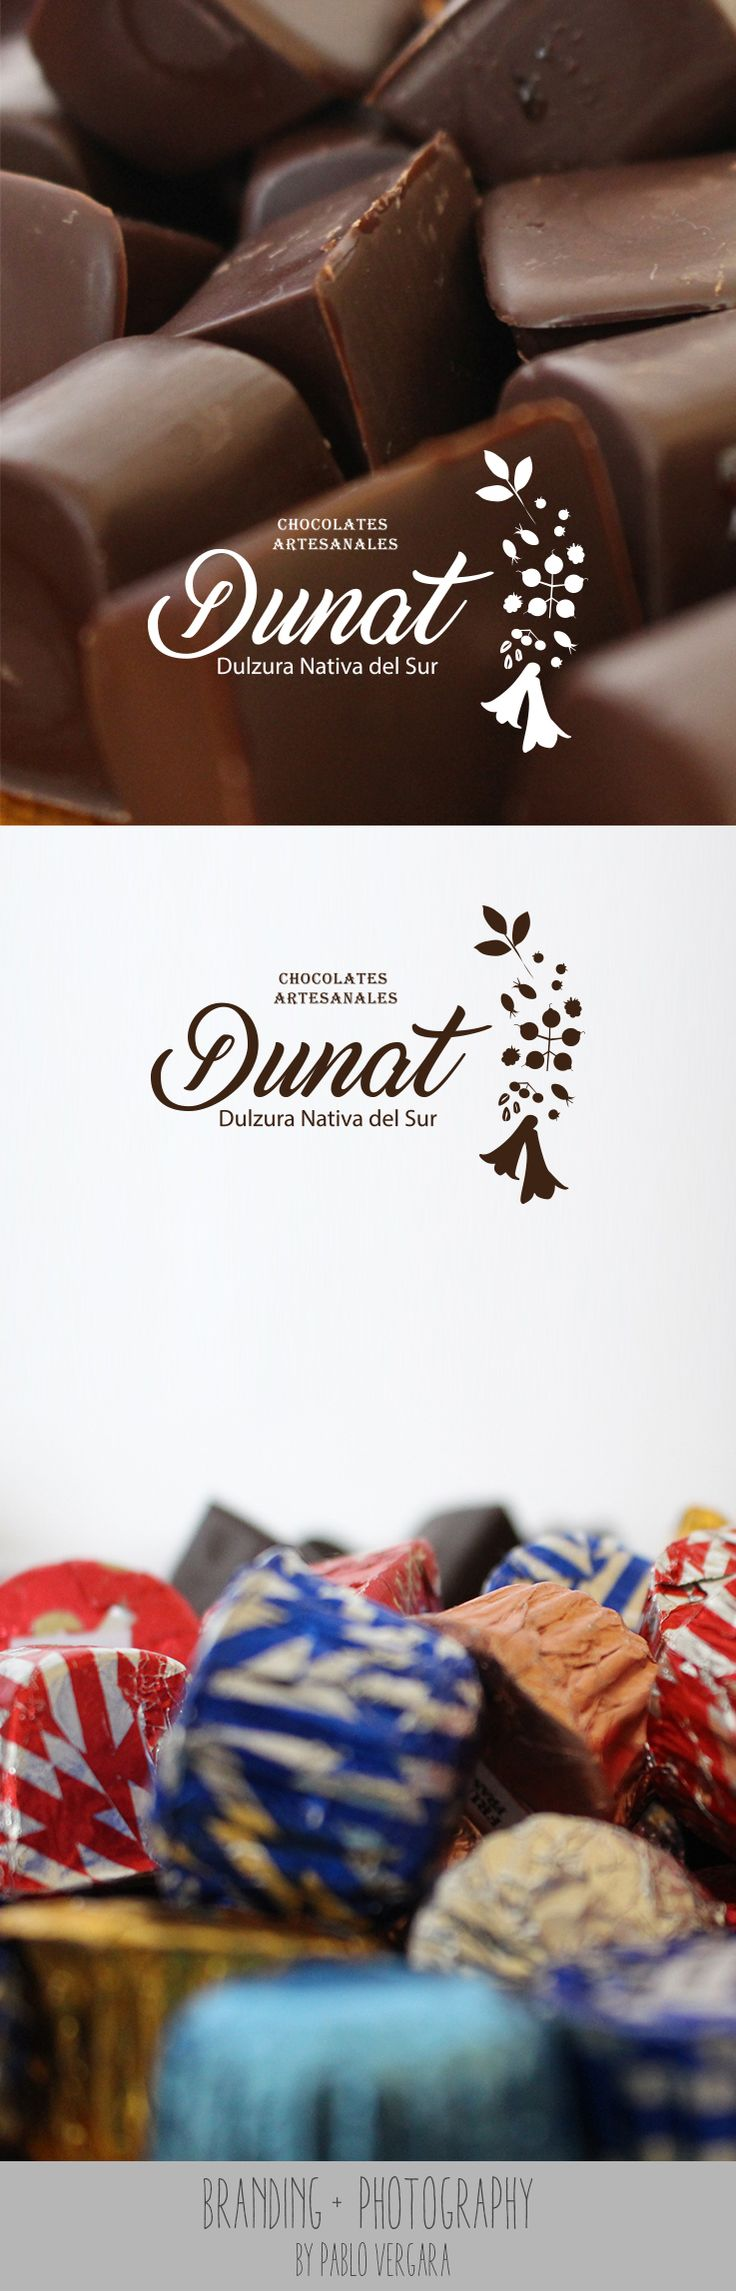 Branding Dunat (Emprendimiento Loncoche) 2016